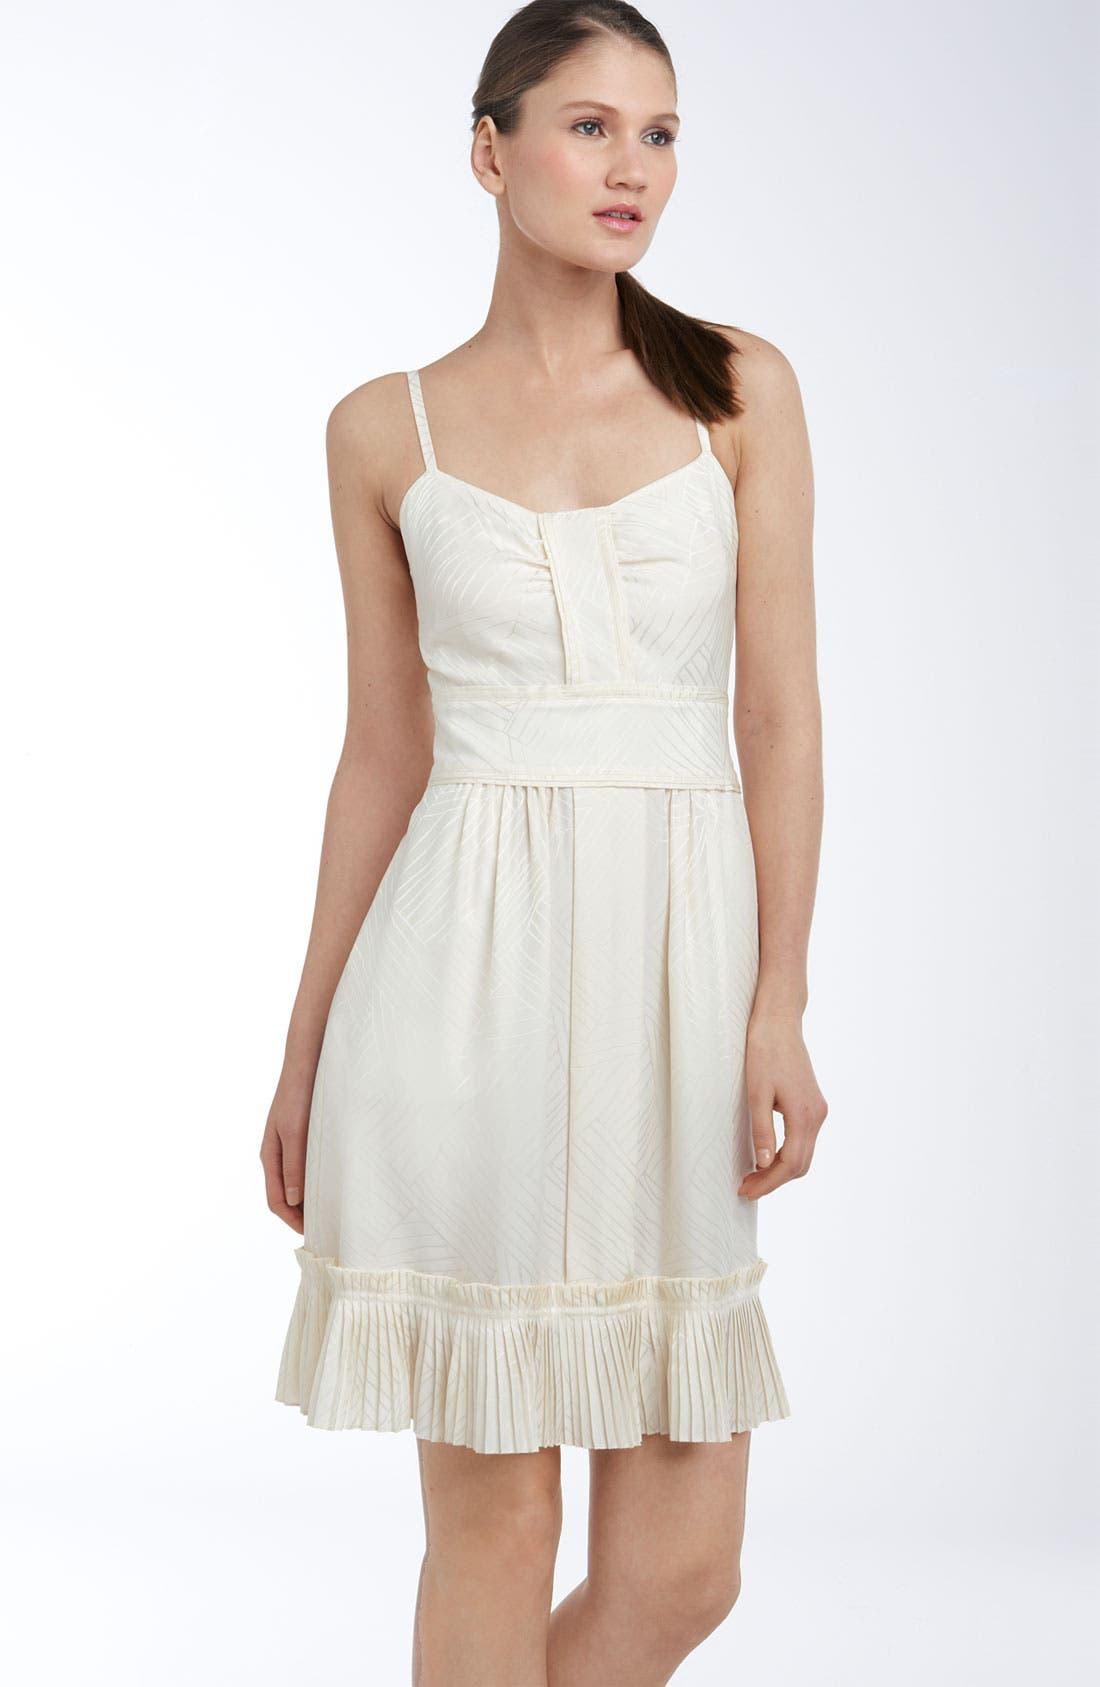 Main Image - MARC BY MARC JACOBS 'Yili' Jacquard Dress